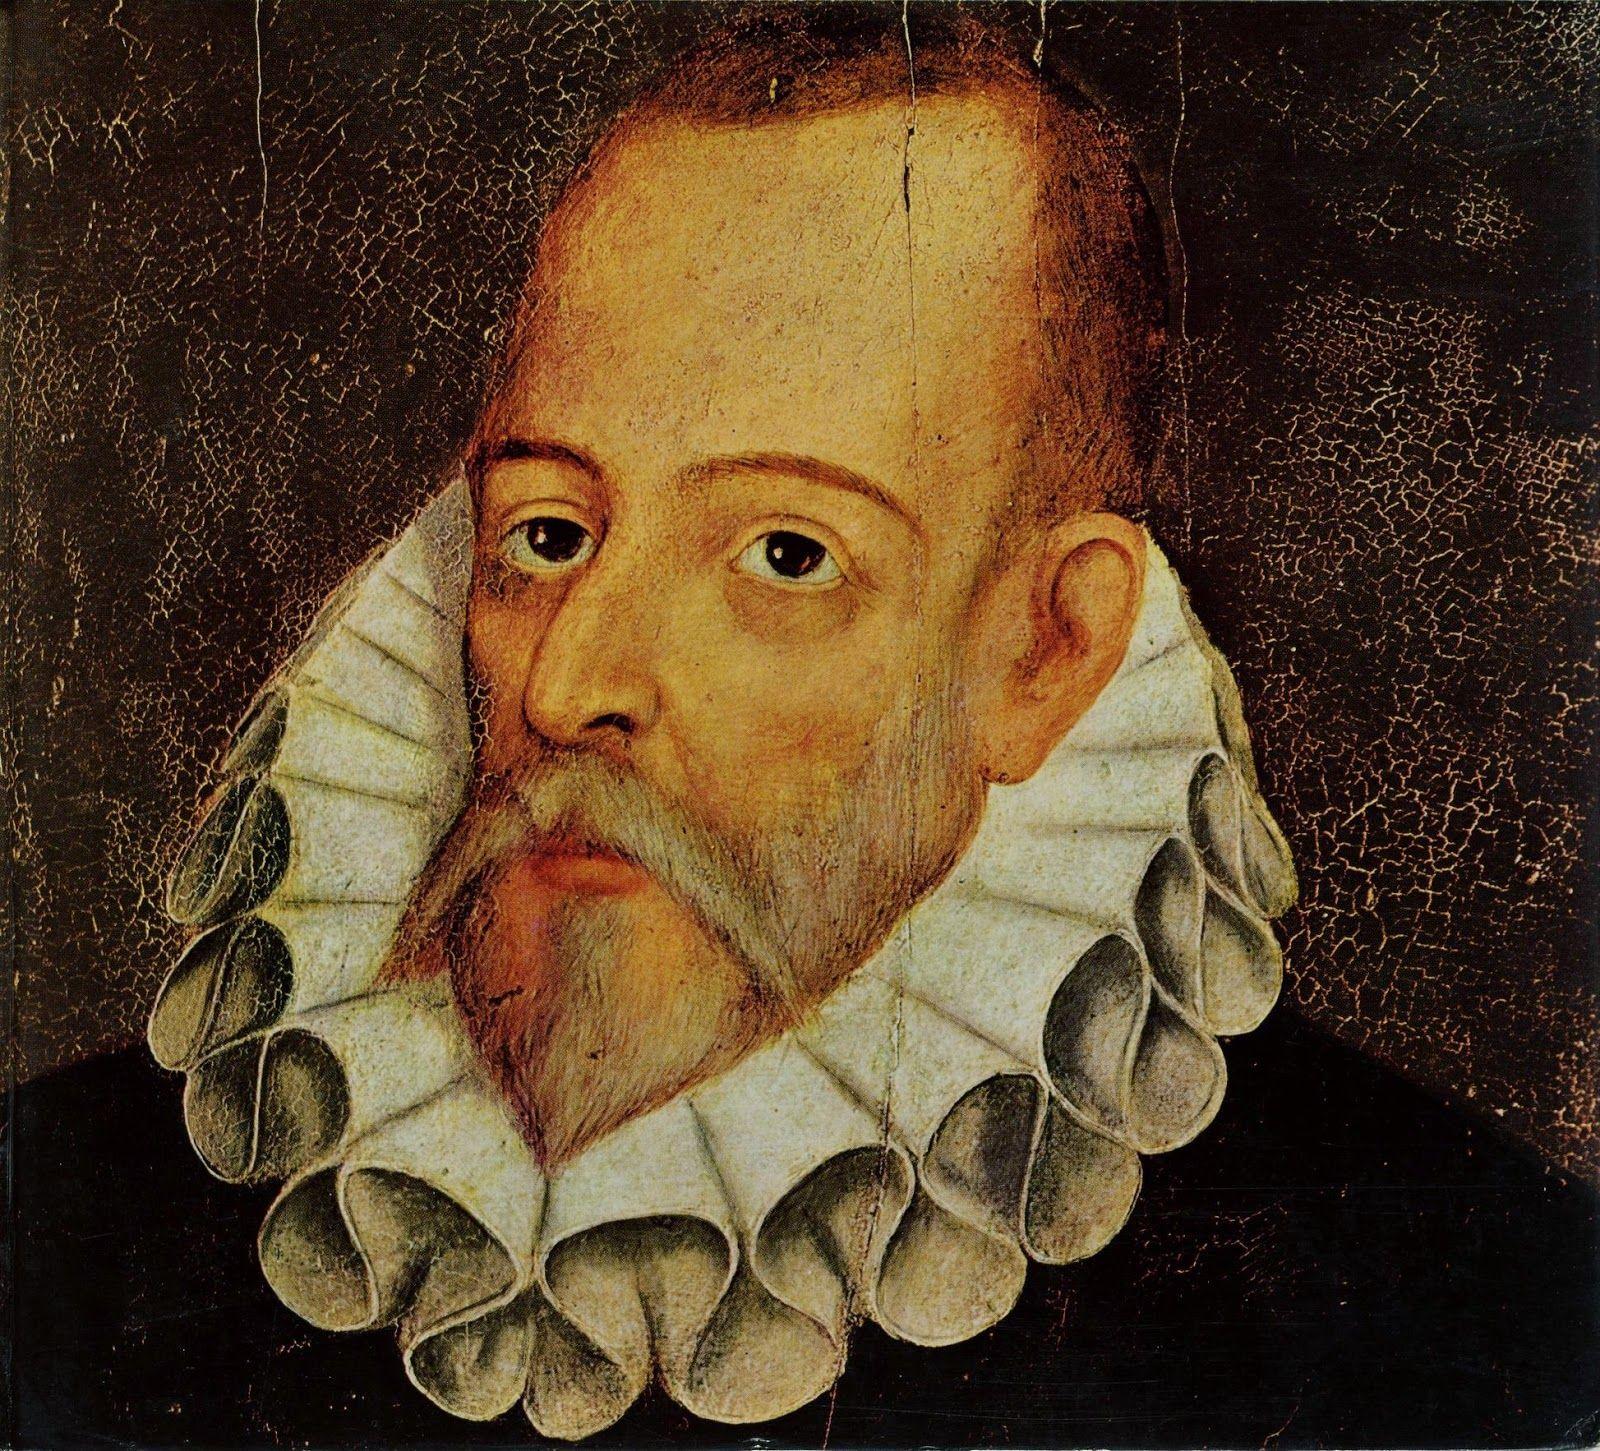 El Famoso Escritor Espanol Cervantes Miguel De Cervantes